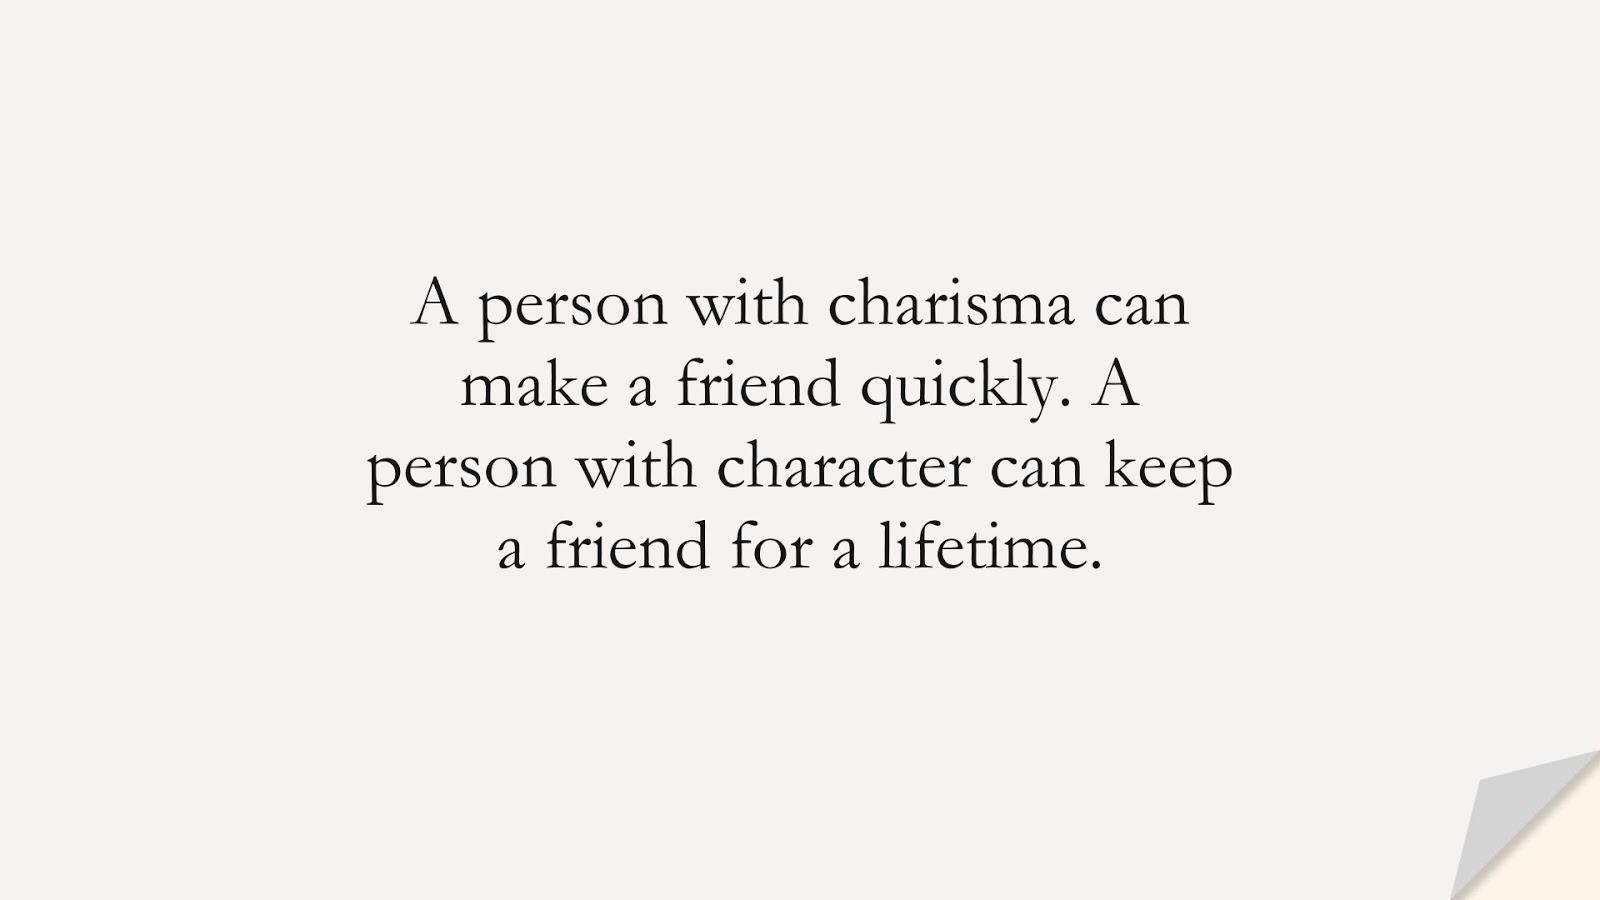 A person with charisma can make a friend quickly. A person with character can keep a friend for a lifetime.FALSE